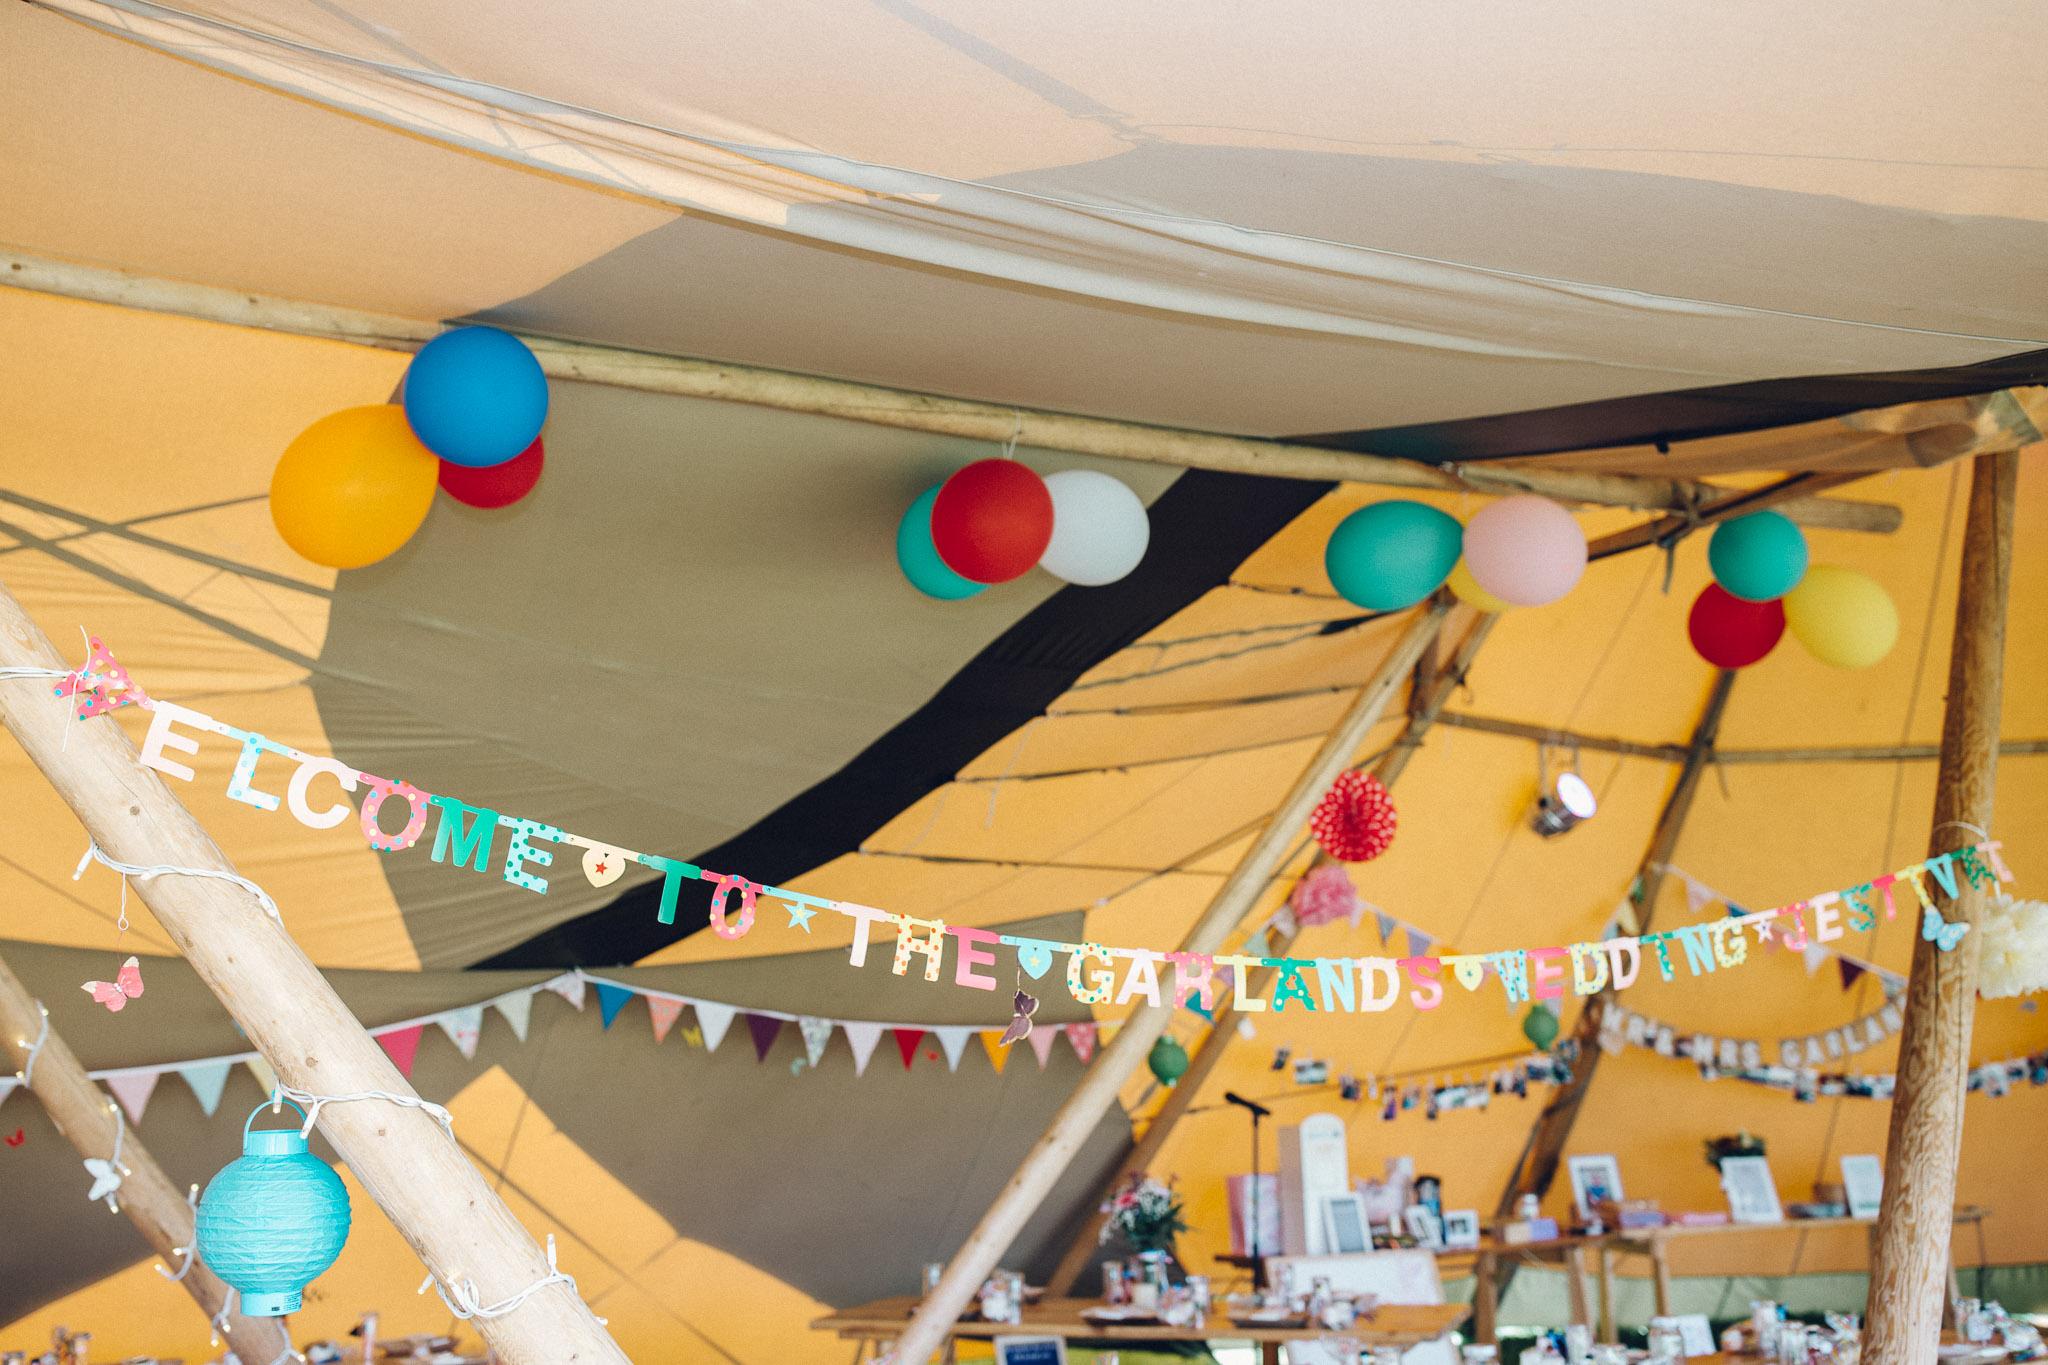 Quirky Festival Tipi decoration Alternative Wedding Photography - I Do The Country Wed, Quainton